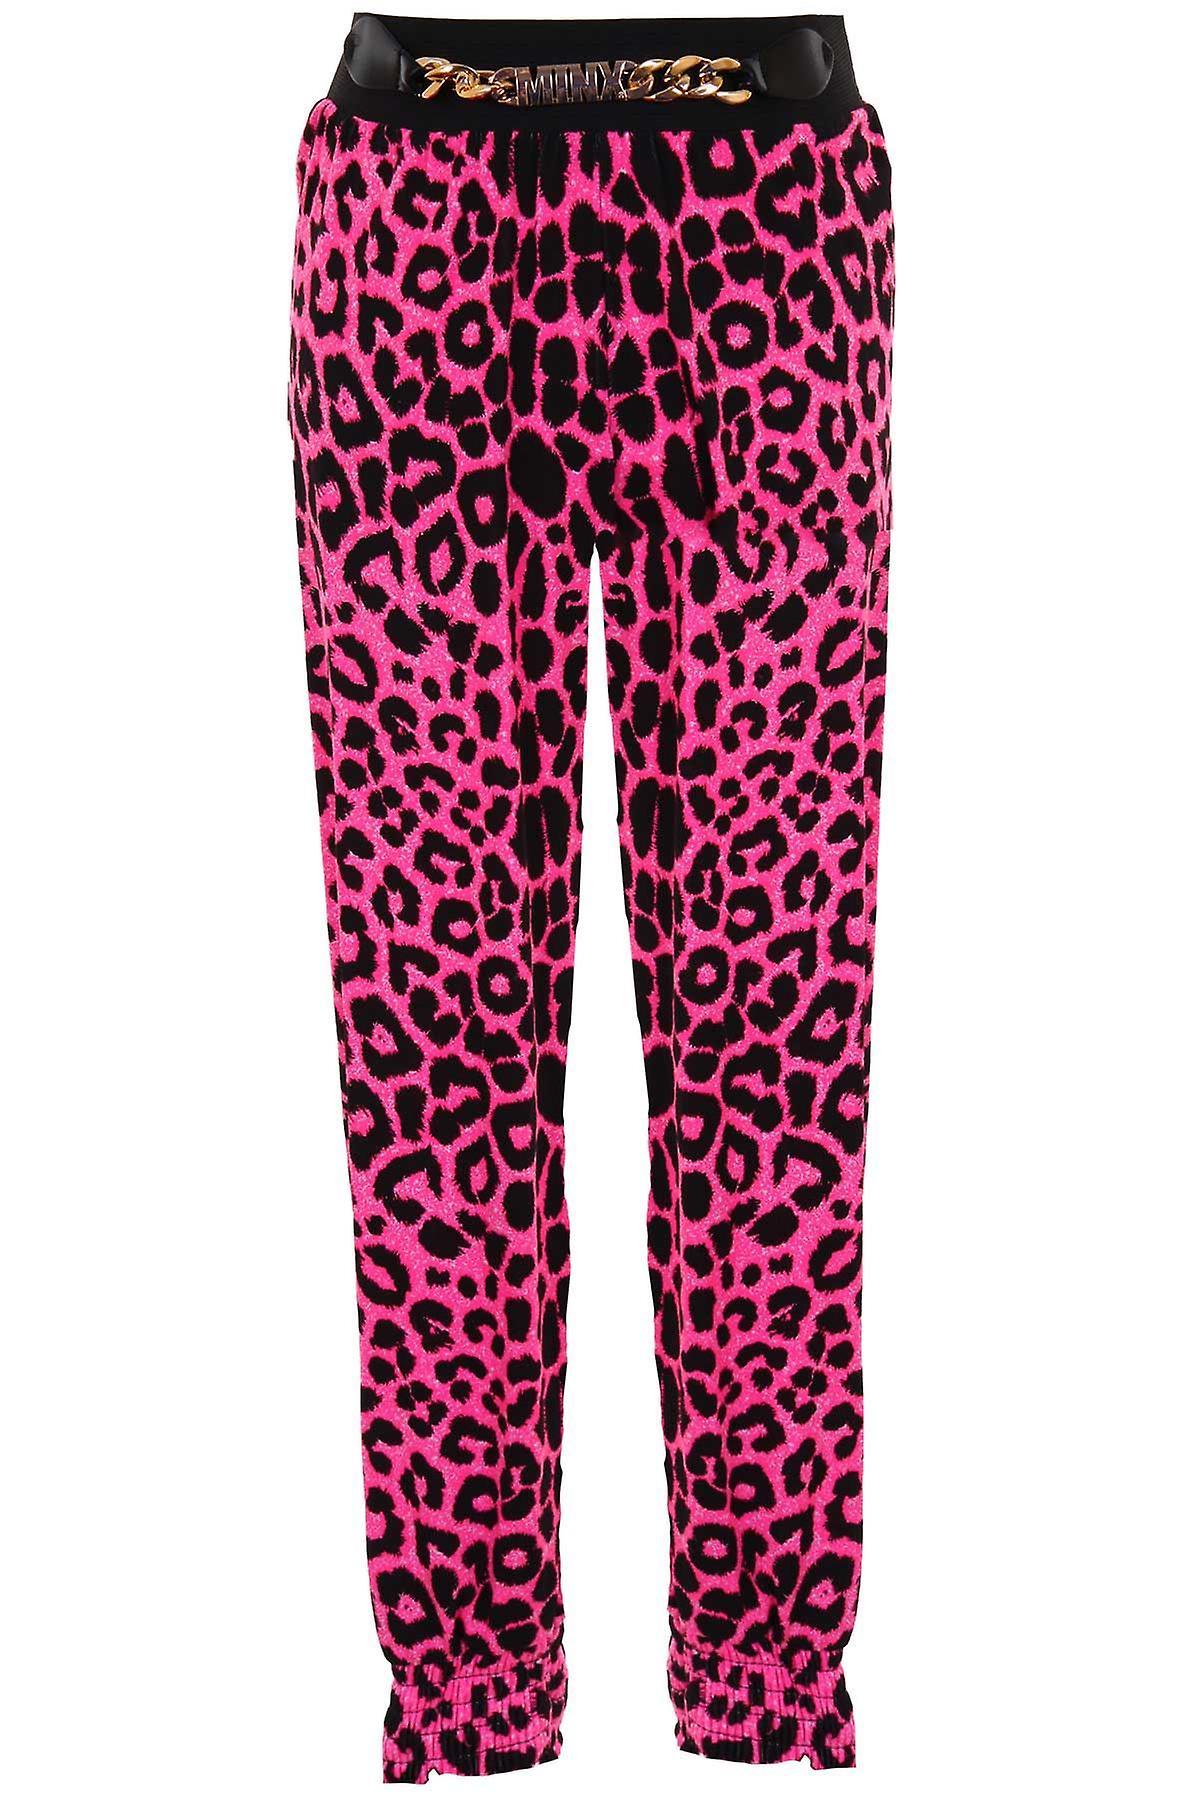 Children's Elasticated Waist Band Leopard Print Girls Gold Buckle Harem Trousers